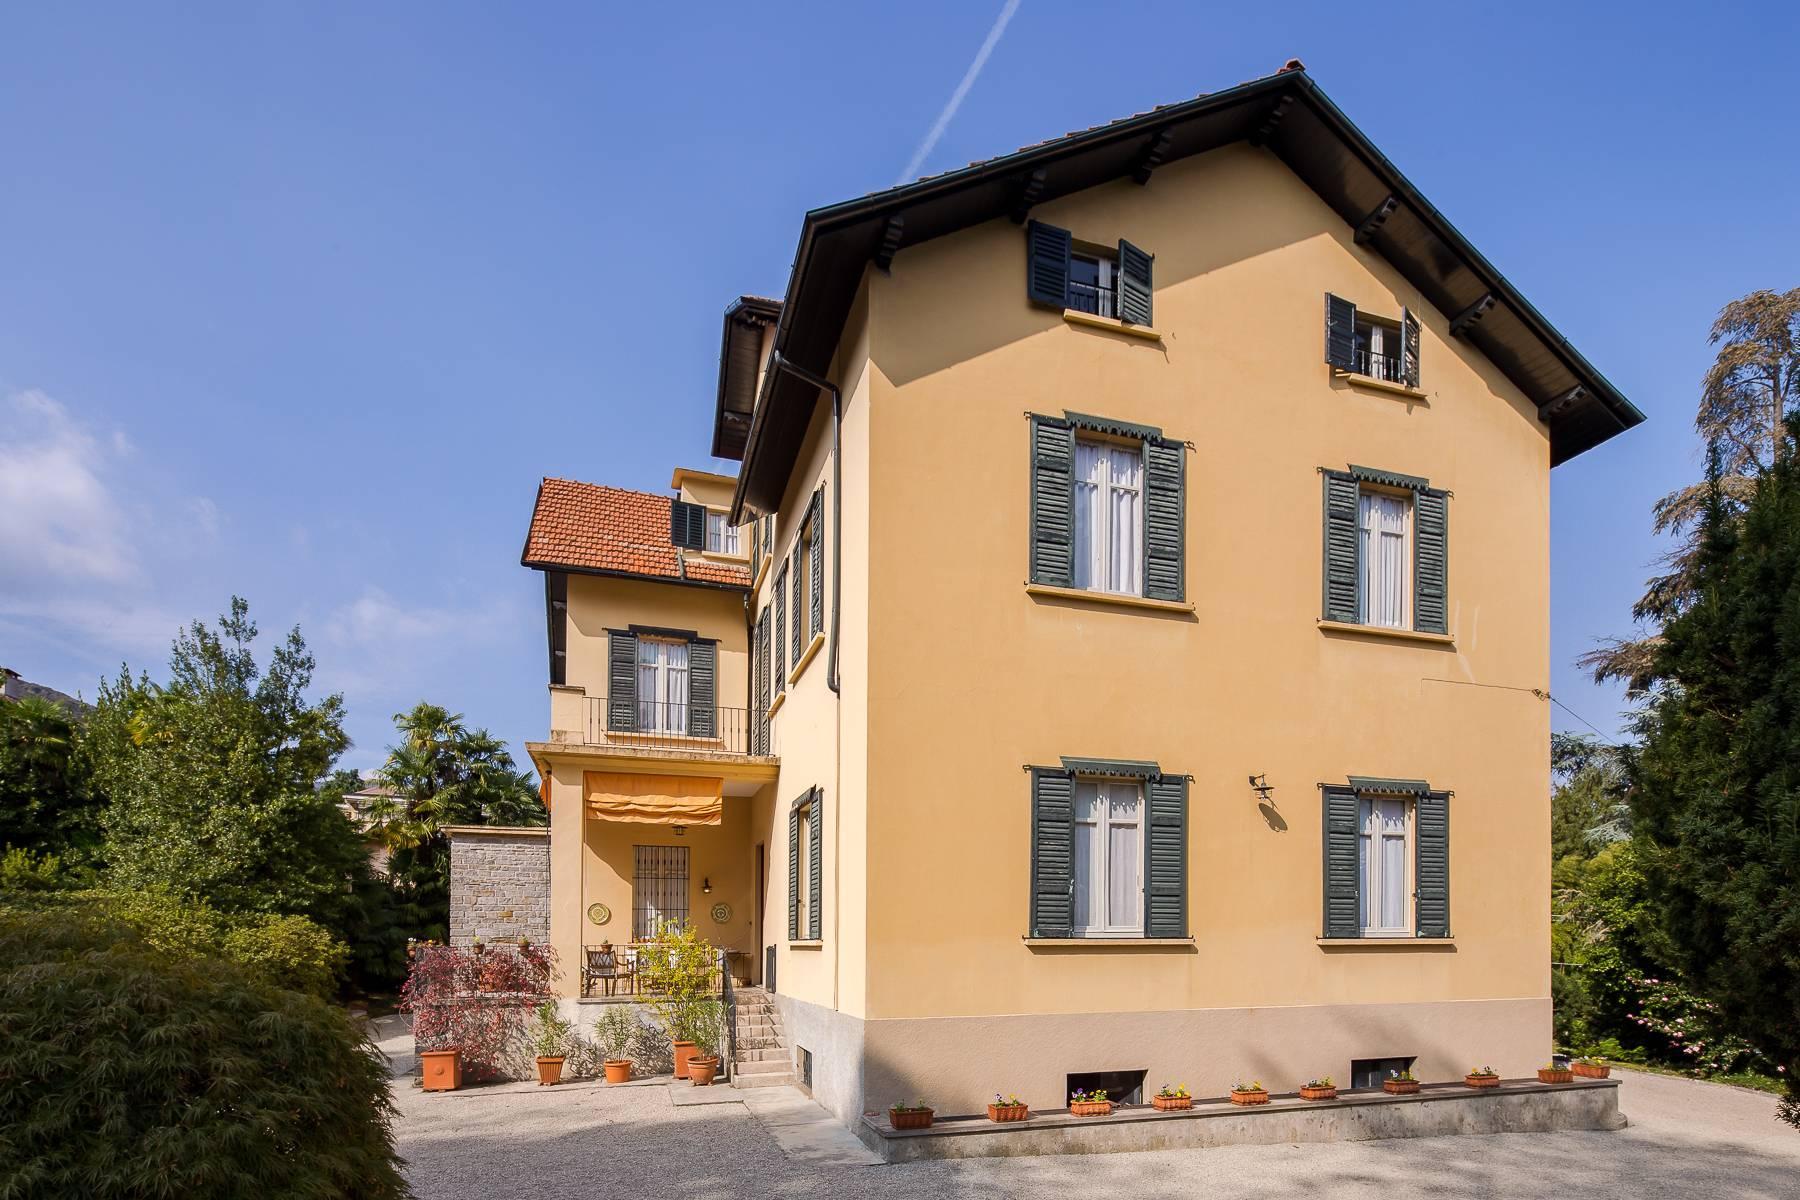 Stresa的历史中心的别墅 - 30